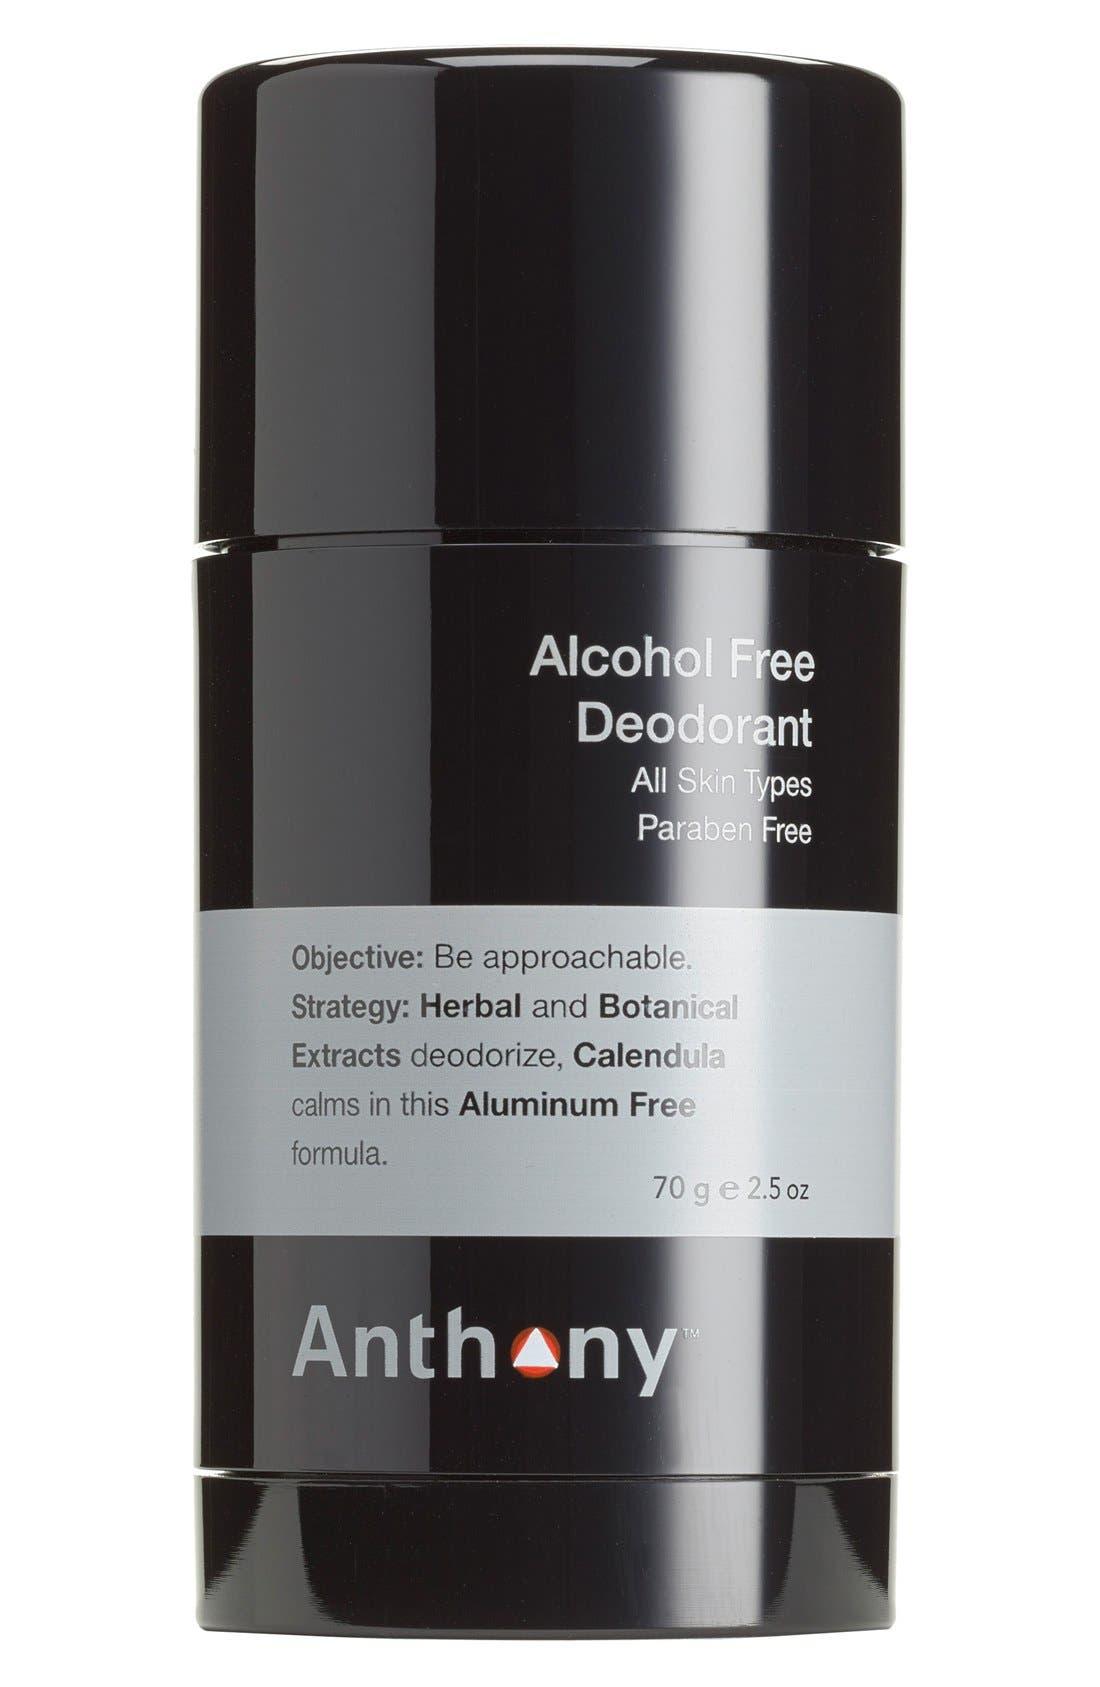 Anthony™ Alcohol Free Deodorant